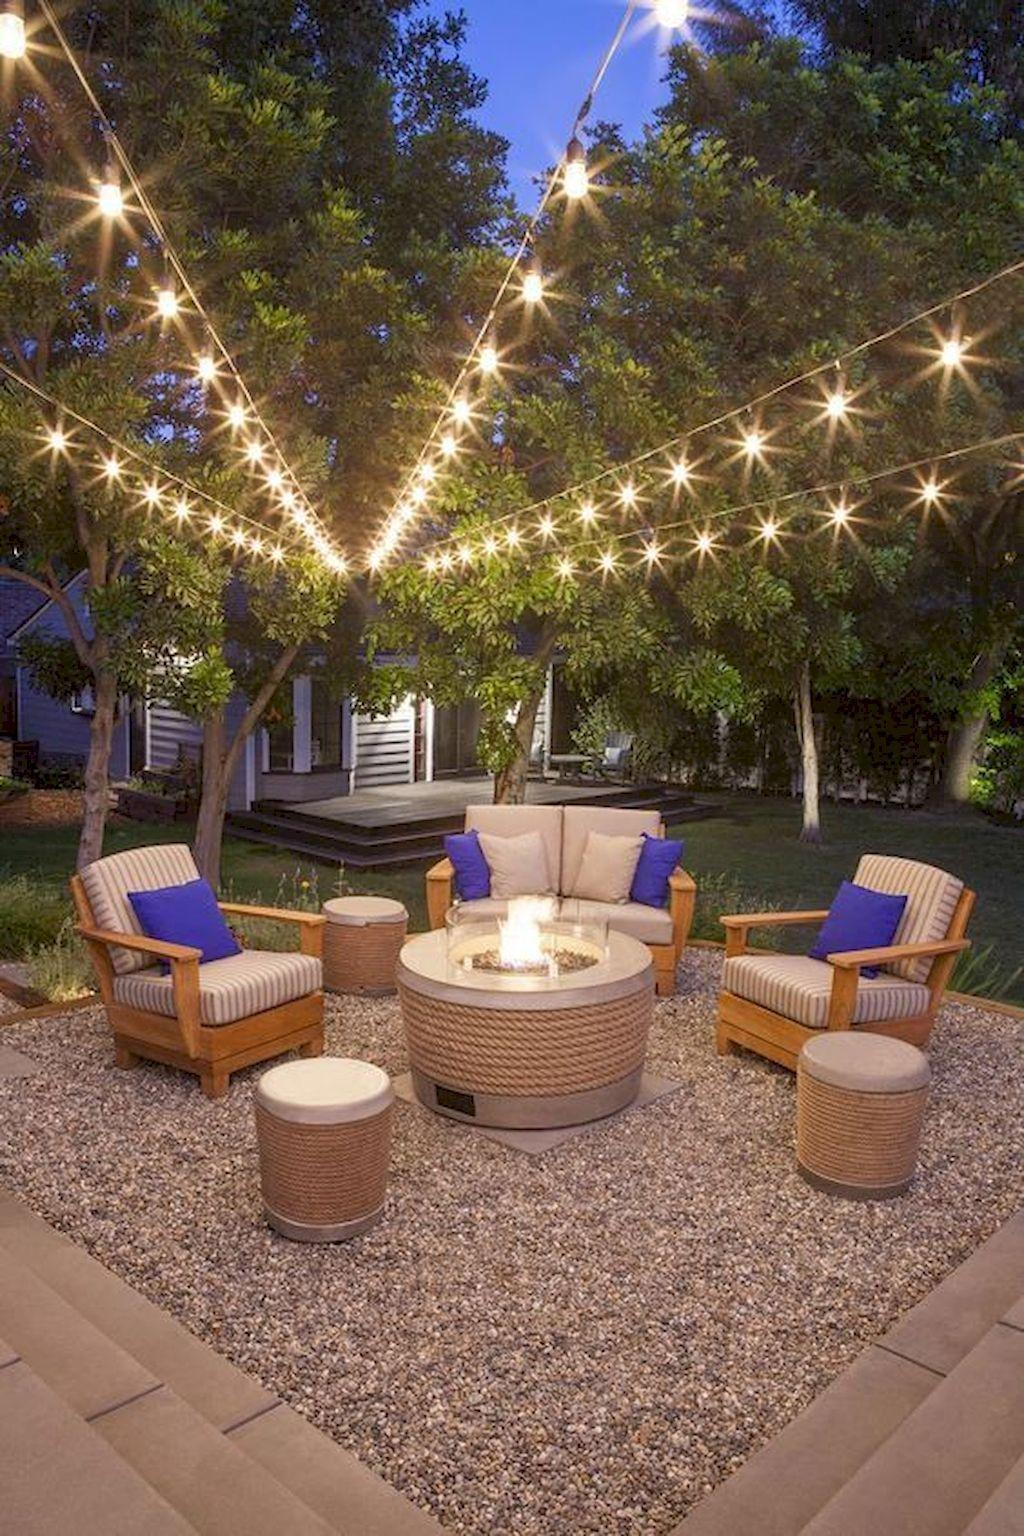 Is Your Outdoor Decor Ready For The Summer Season In 2020 Backyard Fire Fire Pit Backyard Backyard